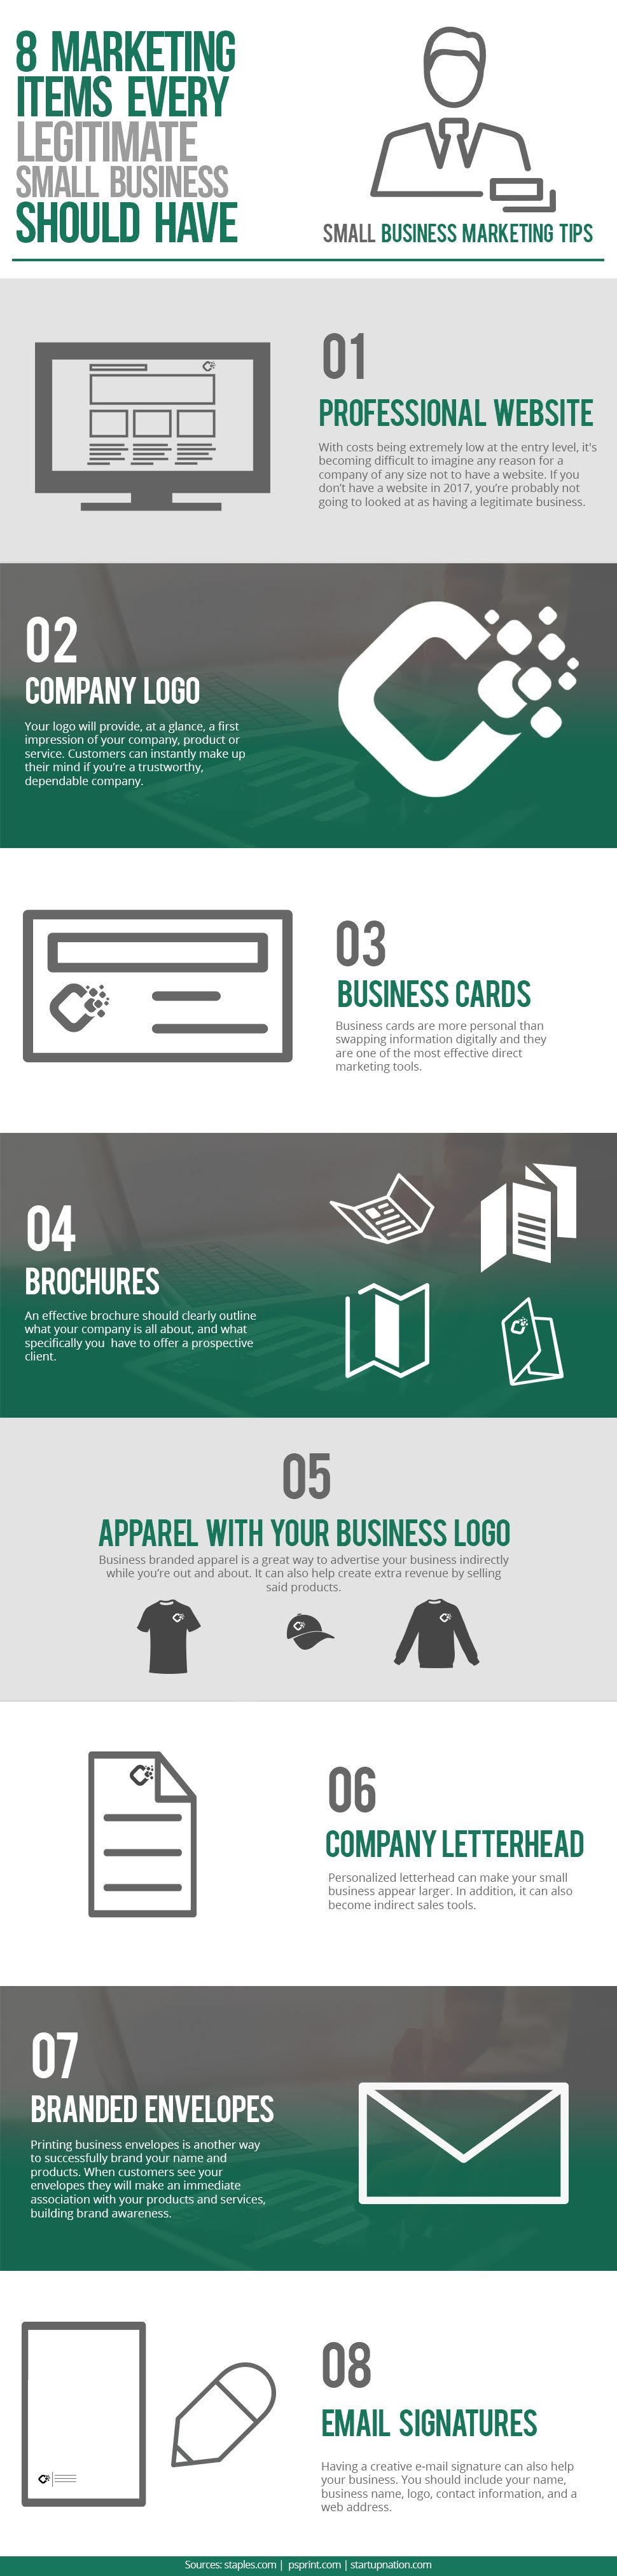 8 Marketing Items Every Legitimate Small Business